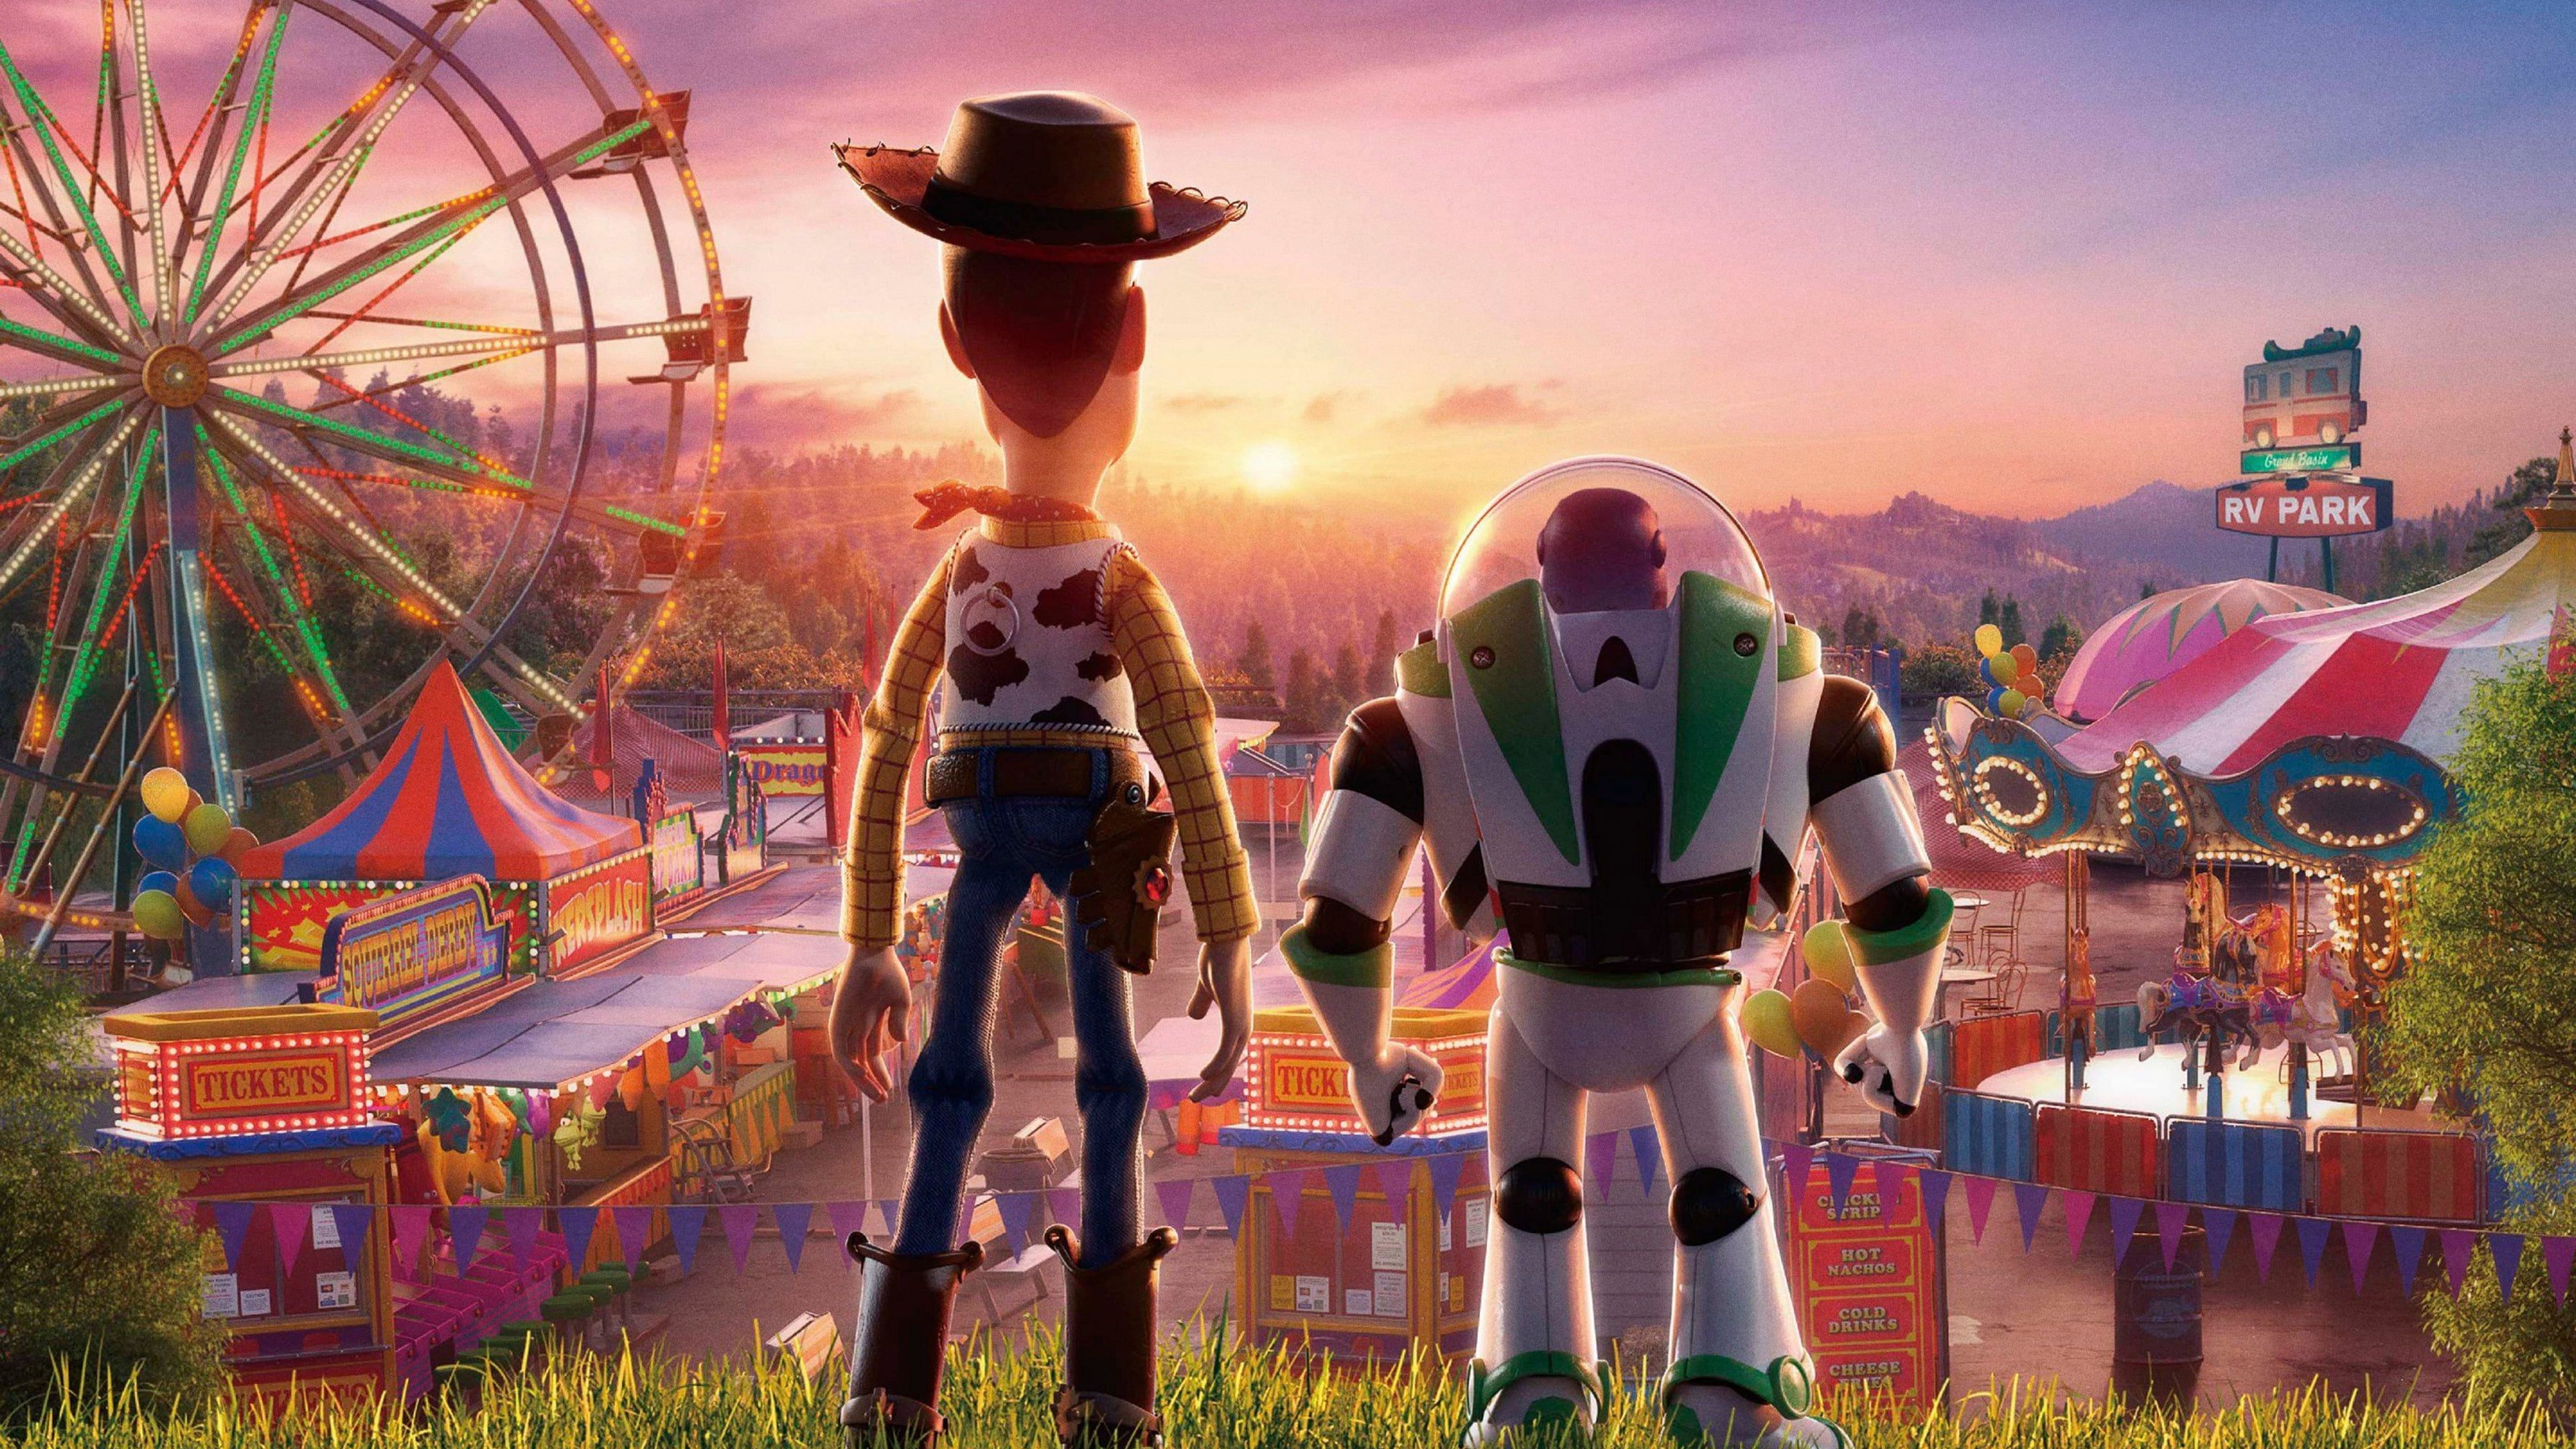 Movie Toy Story 4 Buzz Lightyear Carnival Ferris Wheel Hat Sun Sunset Toy Woody Toy Story 4k Wallpaper In 2021 Woody Toy Story Toy Story Buzz Toy Story Movie